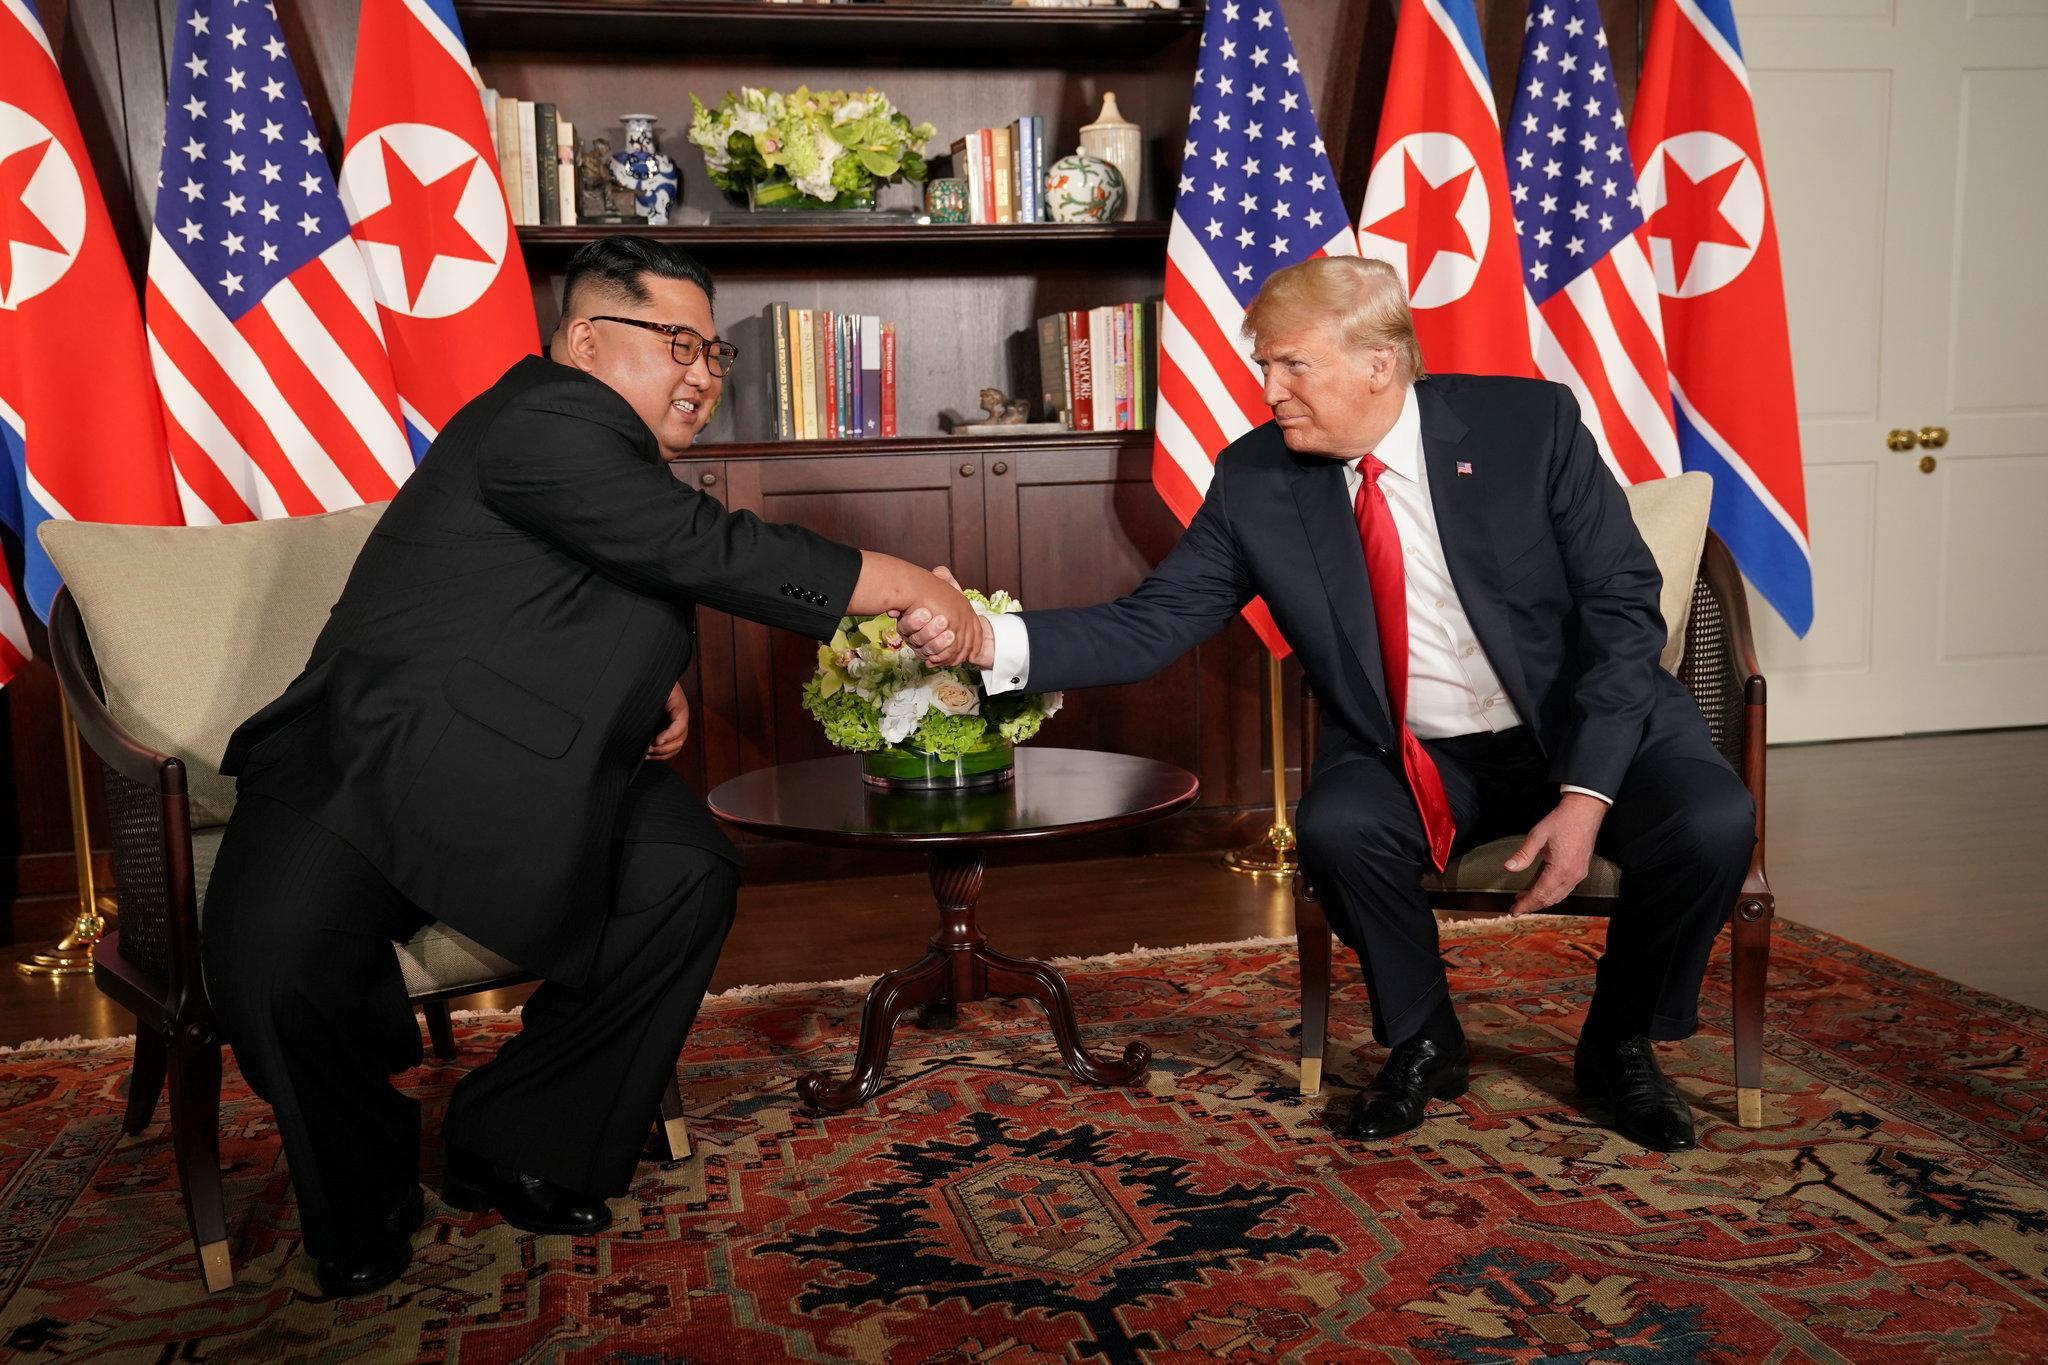 5 lan bat tay, 4 cam ket lon trong ngay lich su Kim - Trump hinh anh 5